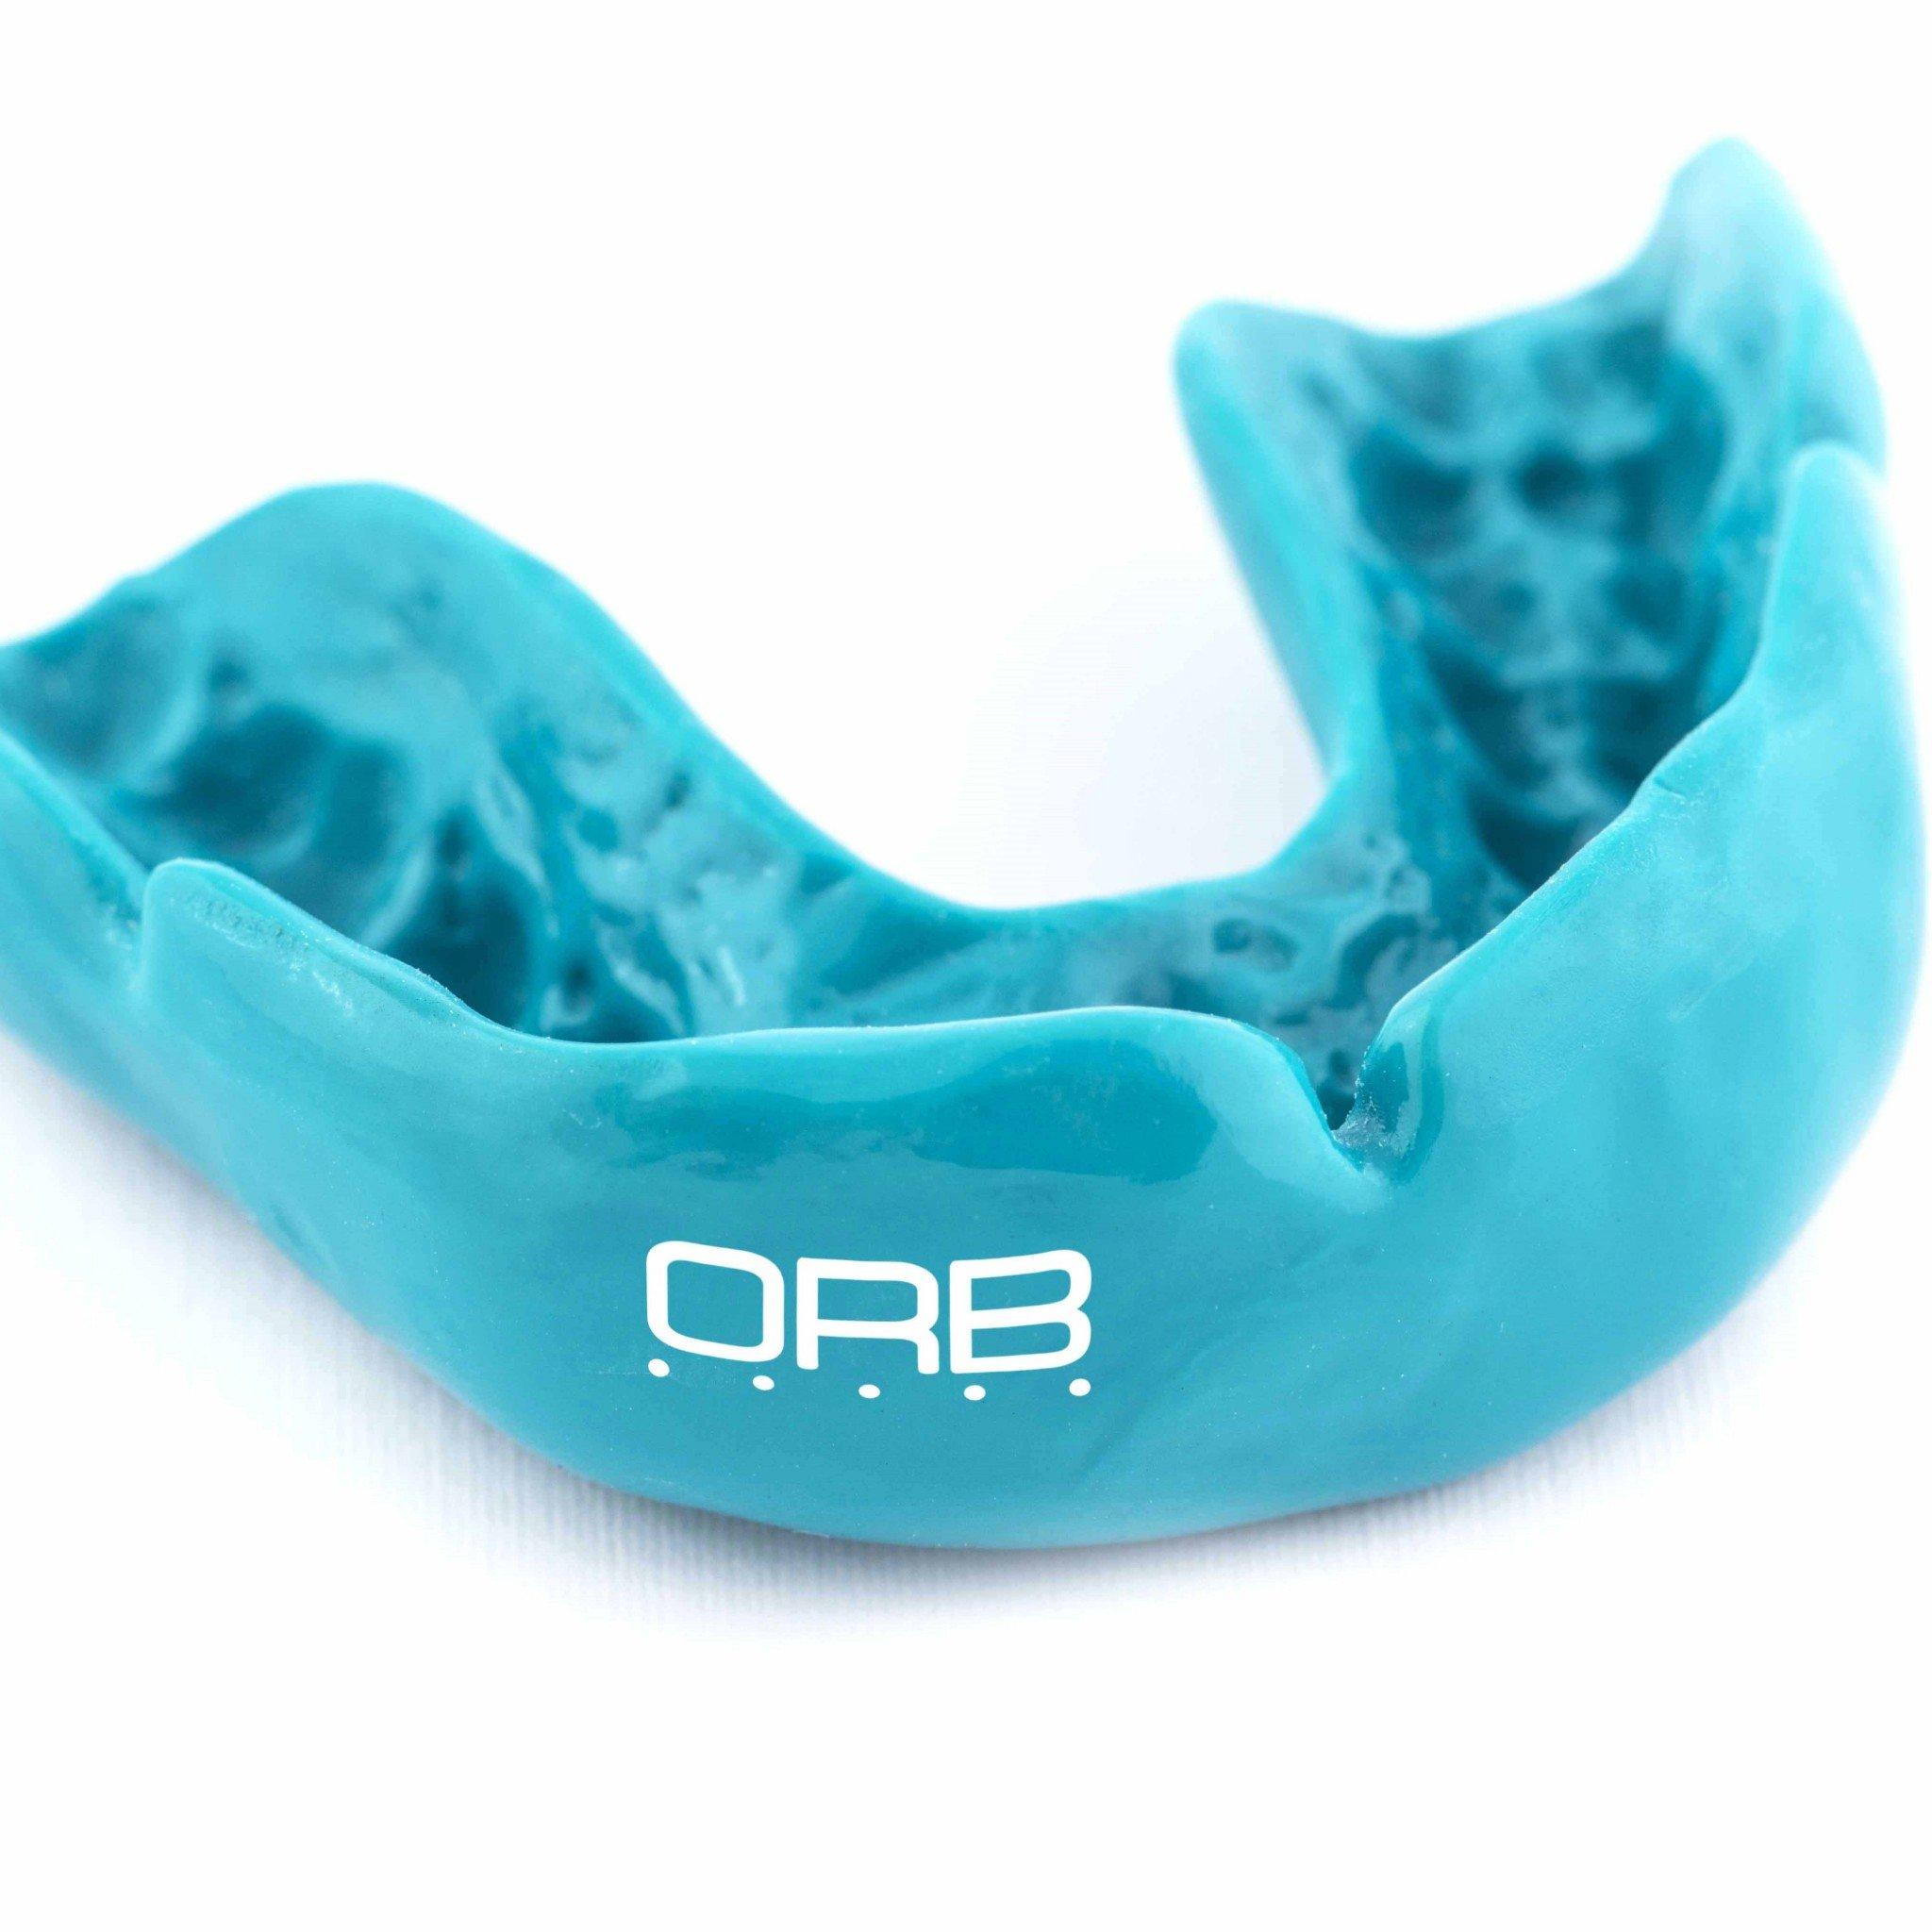 Orb mouthguard